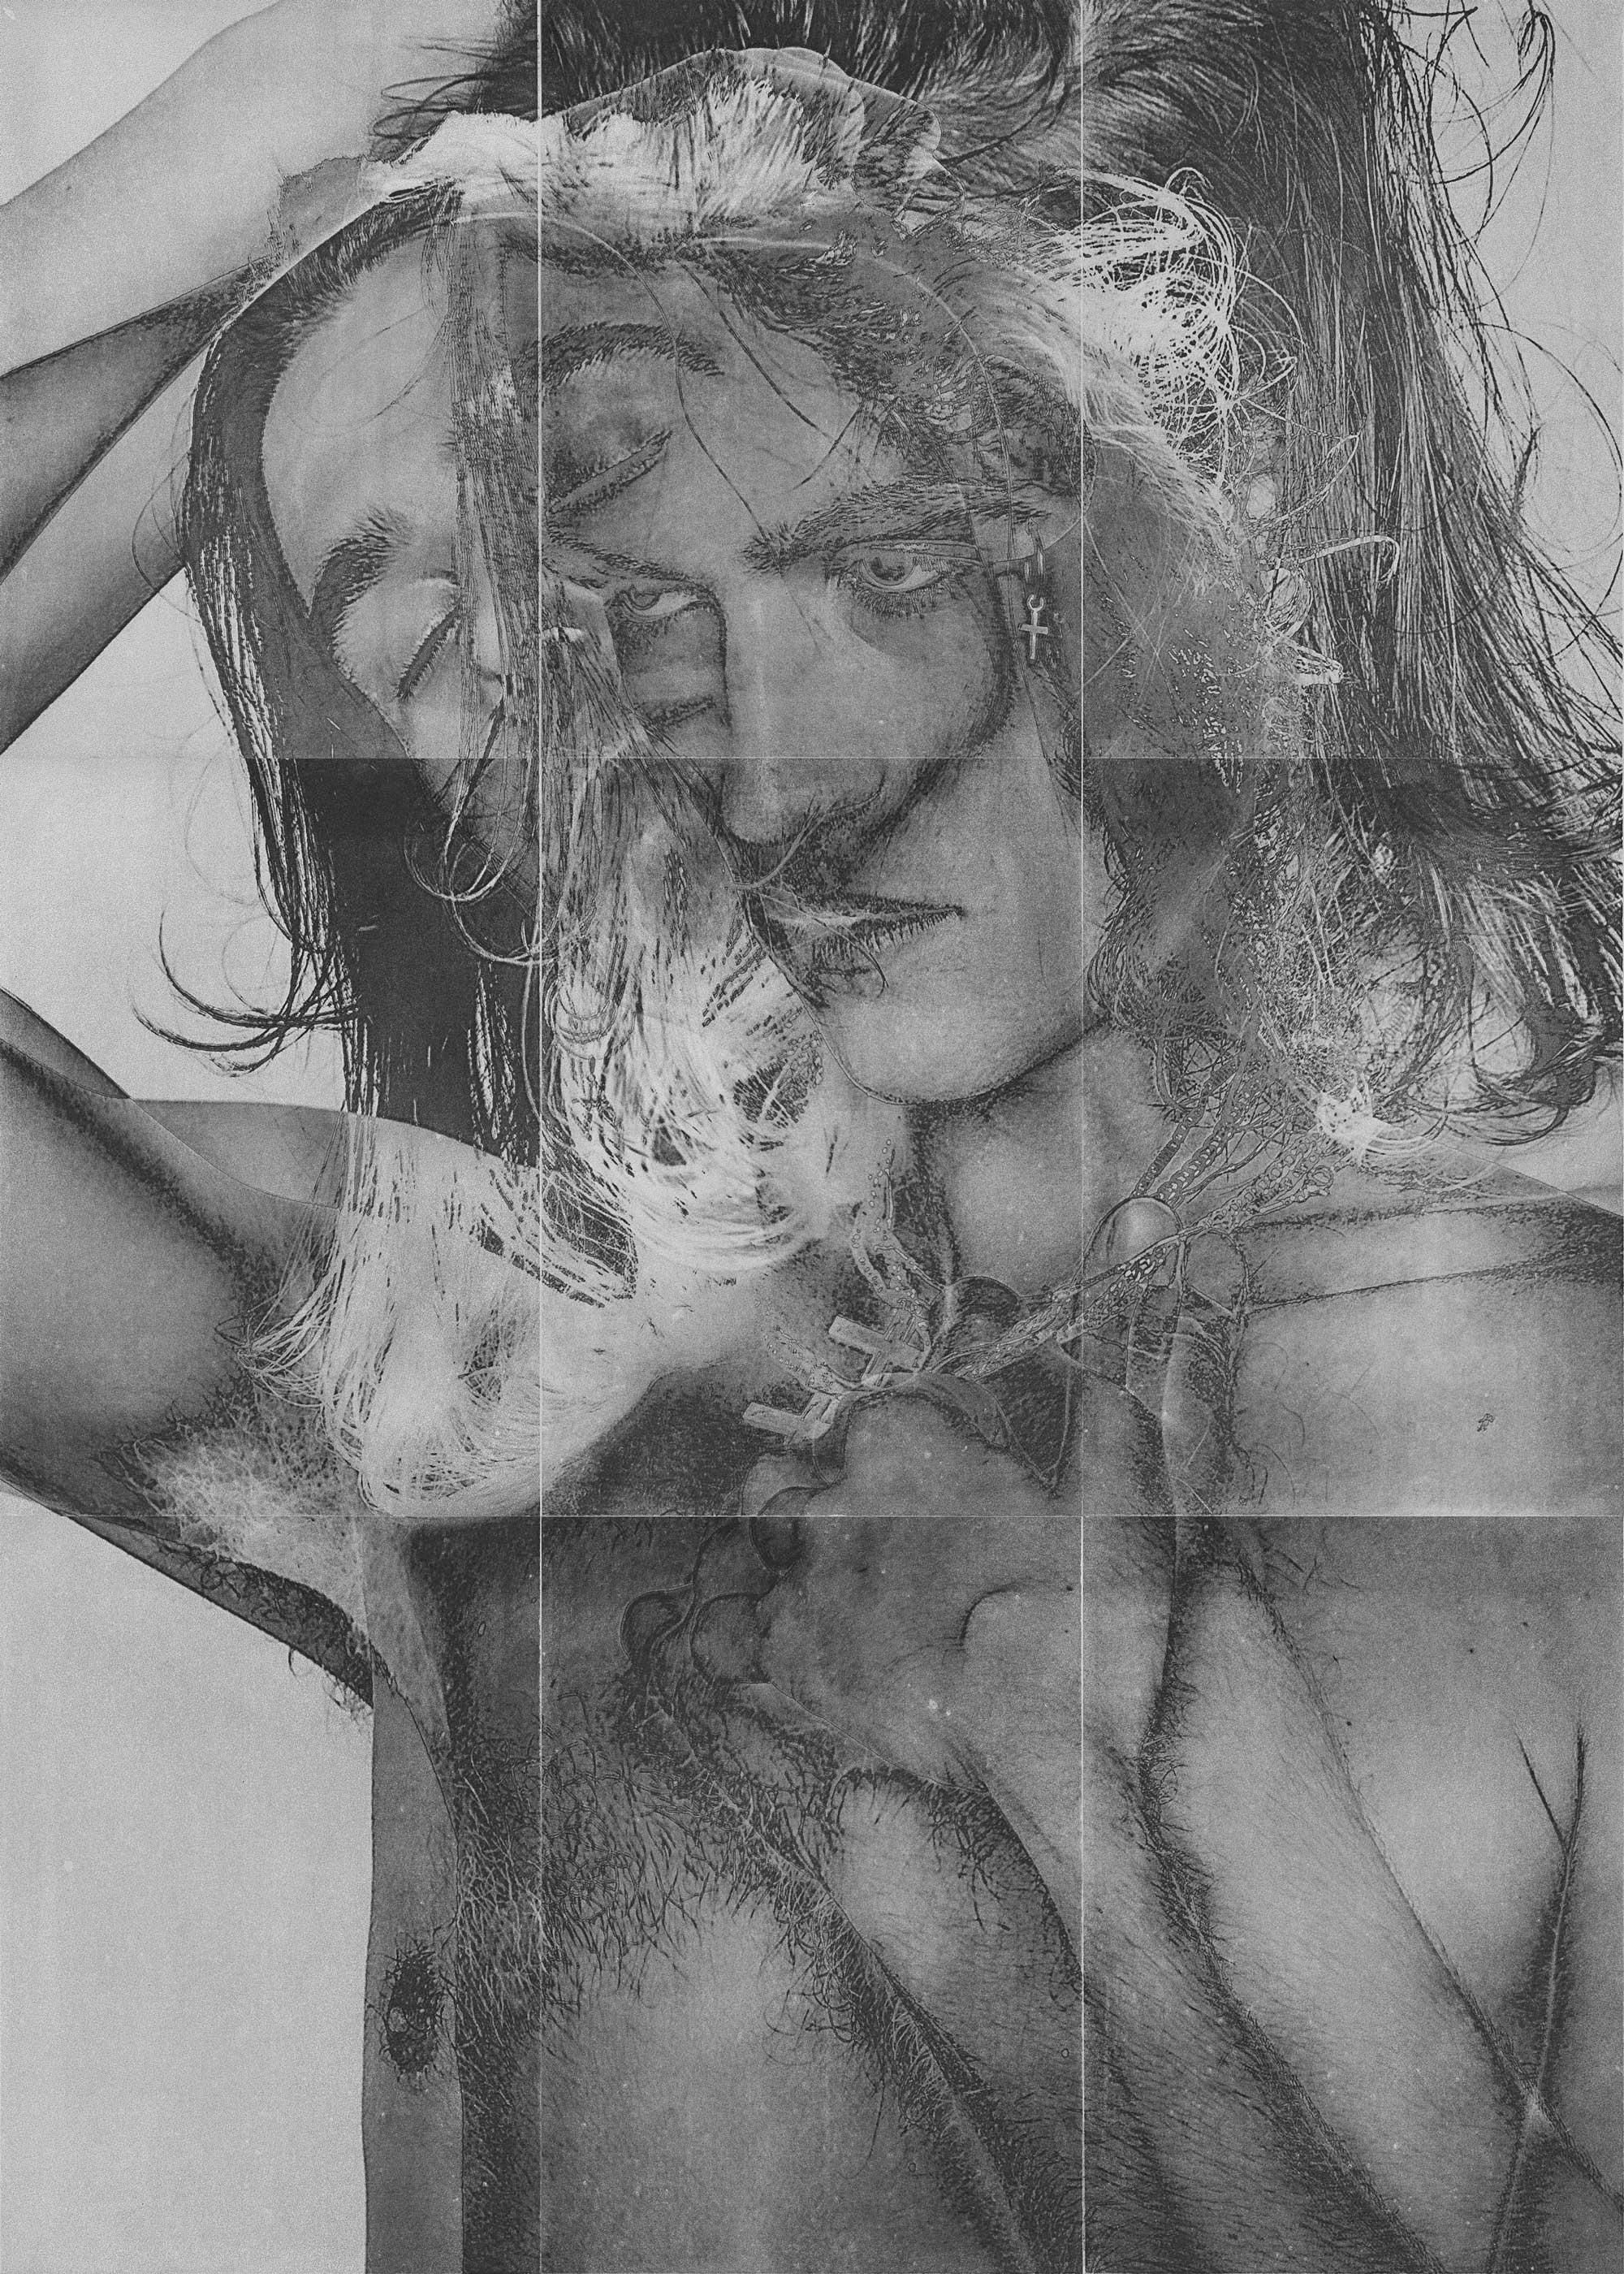 Tommy_Mirrored_VIII_All_Web_SML.jpg